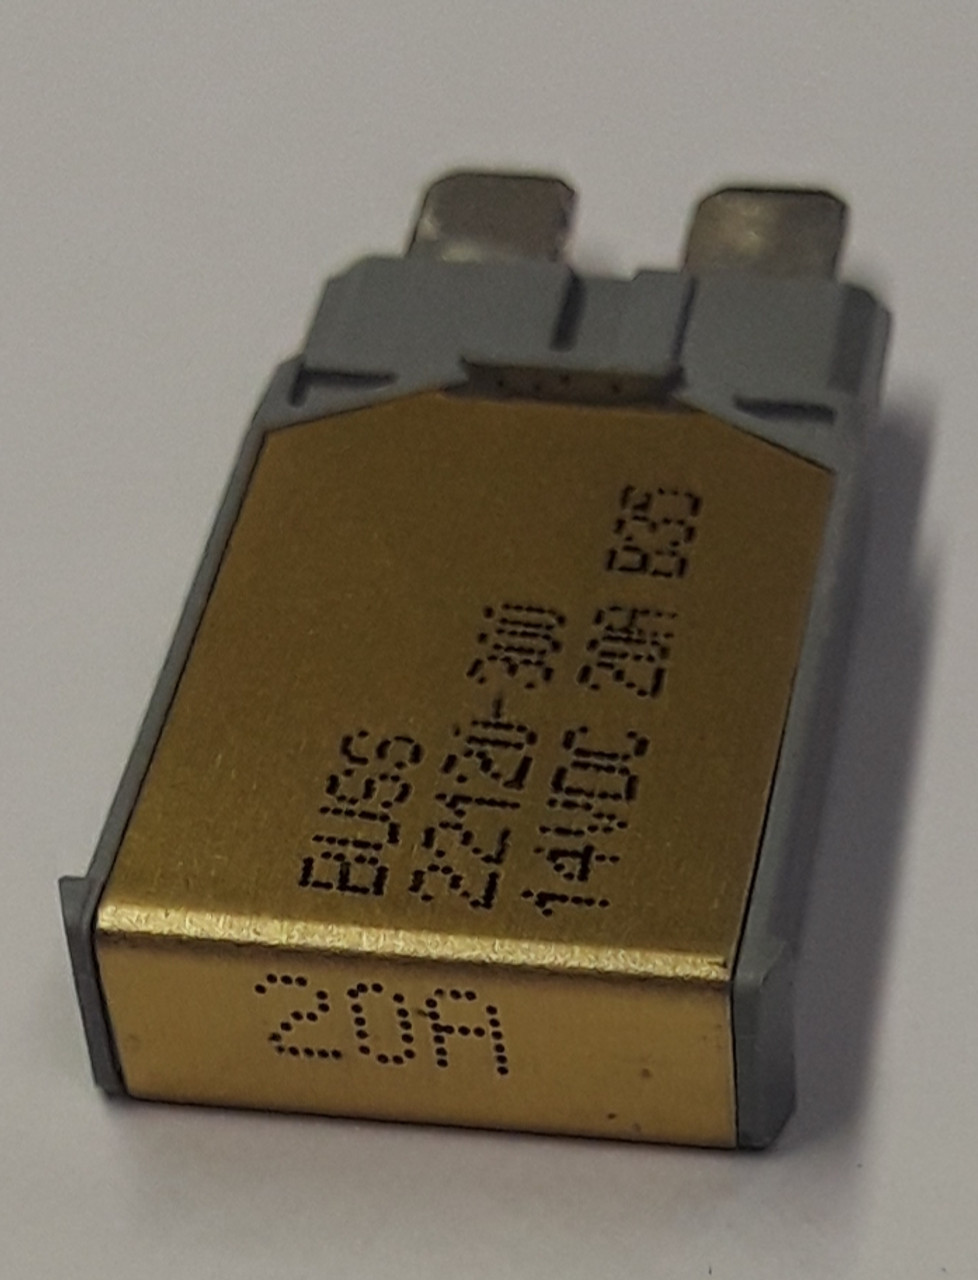 medium resolution of 22120 300 cooper bussmann type 1 mini circuit breaker auto reset 20 amps